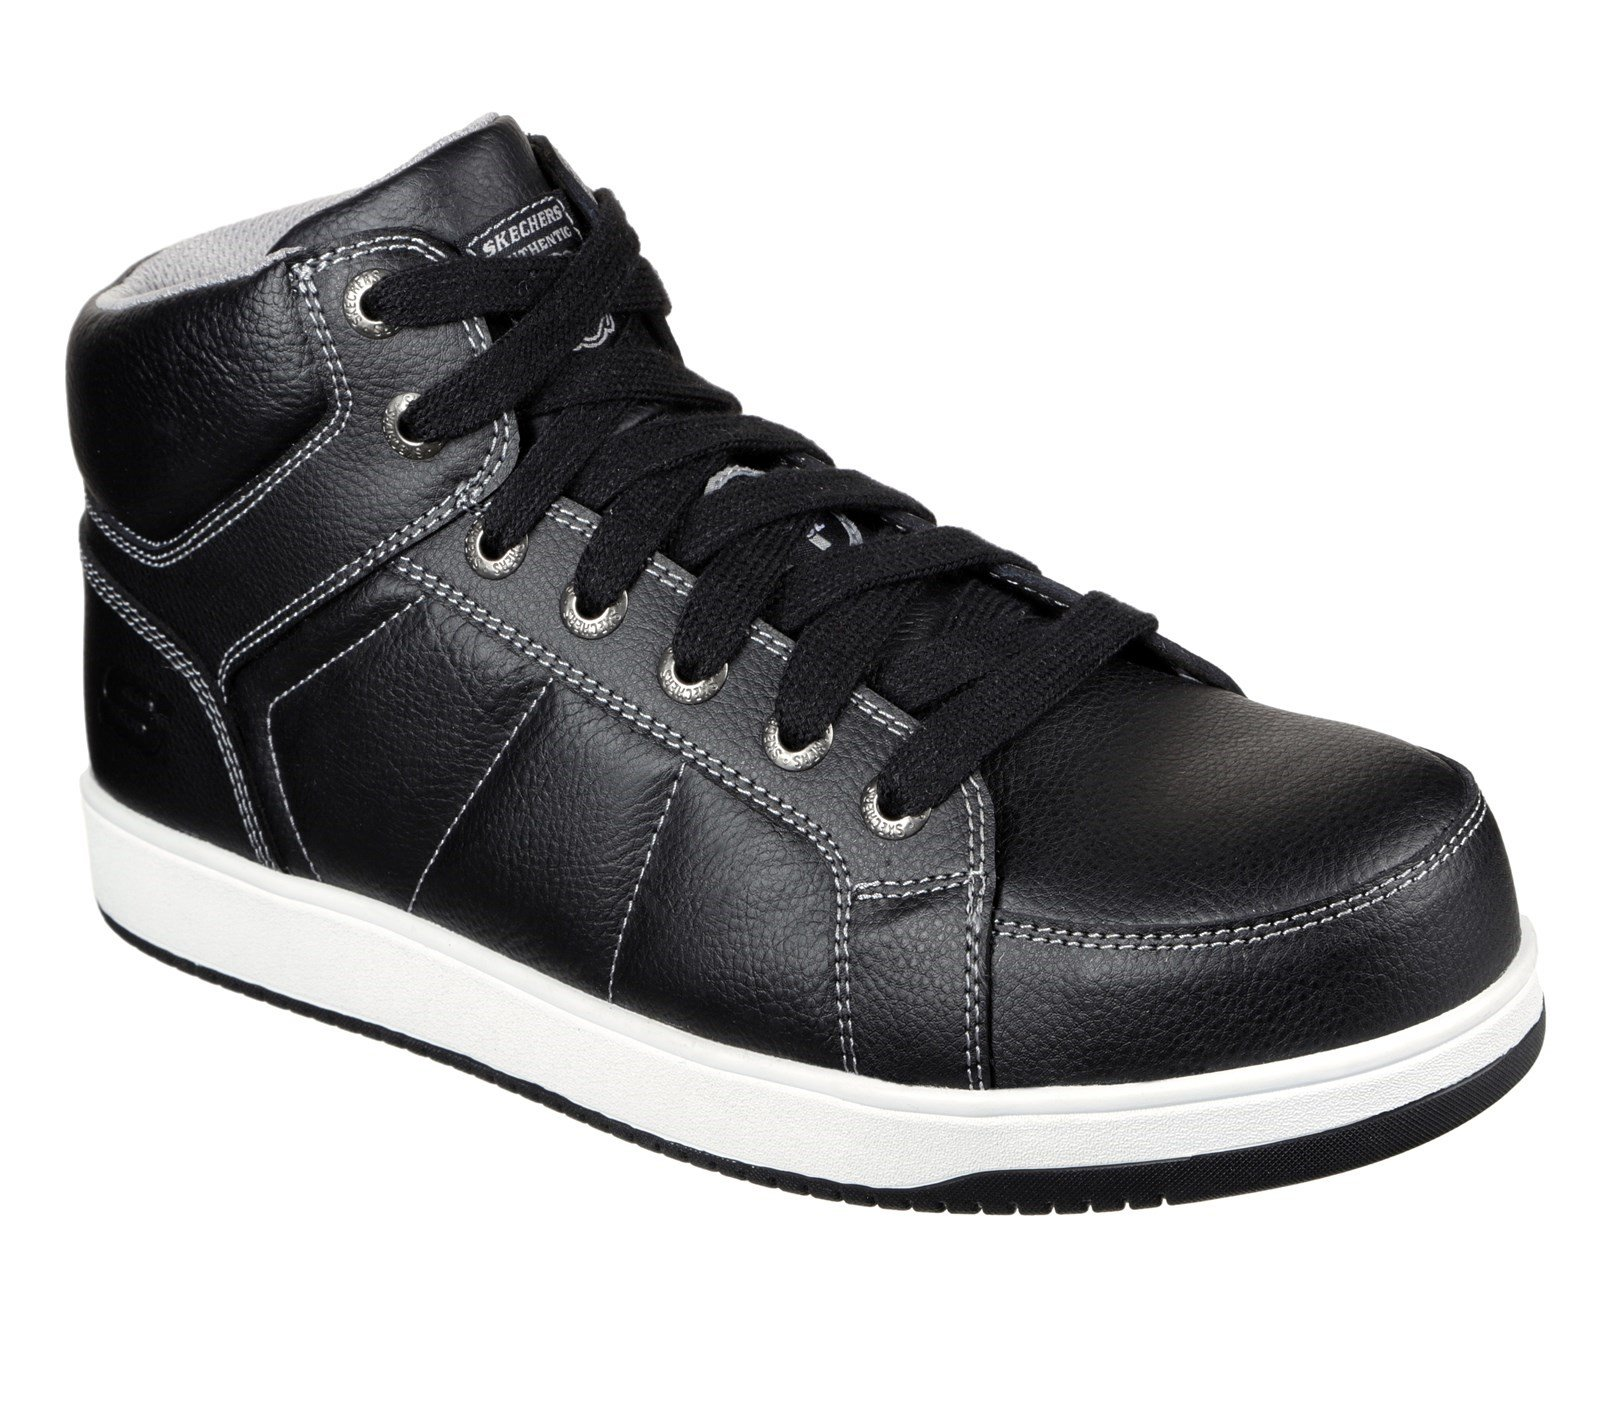 Skechers Unisex Watab Safety Boot Black 32314 - Black 6